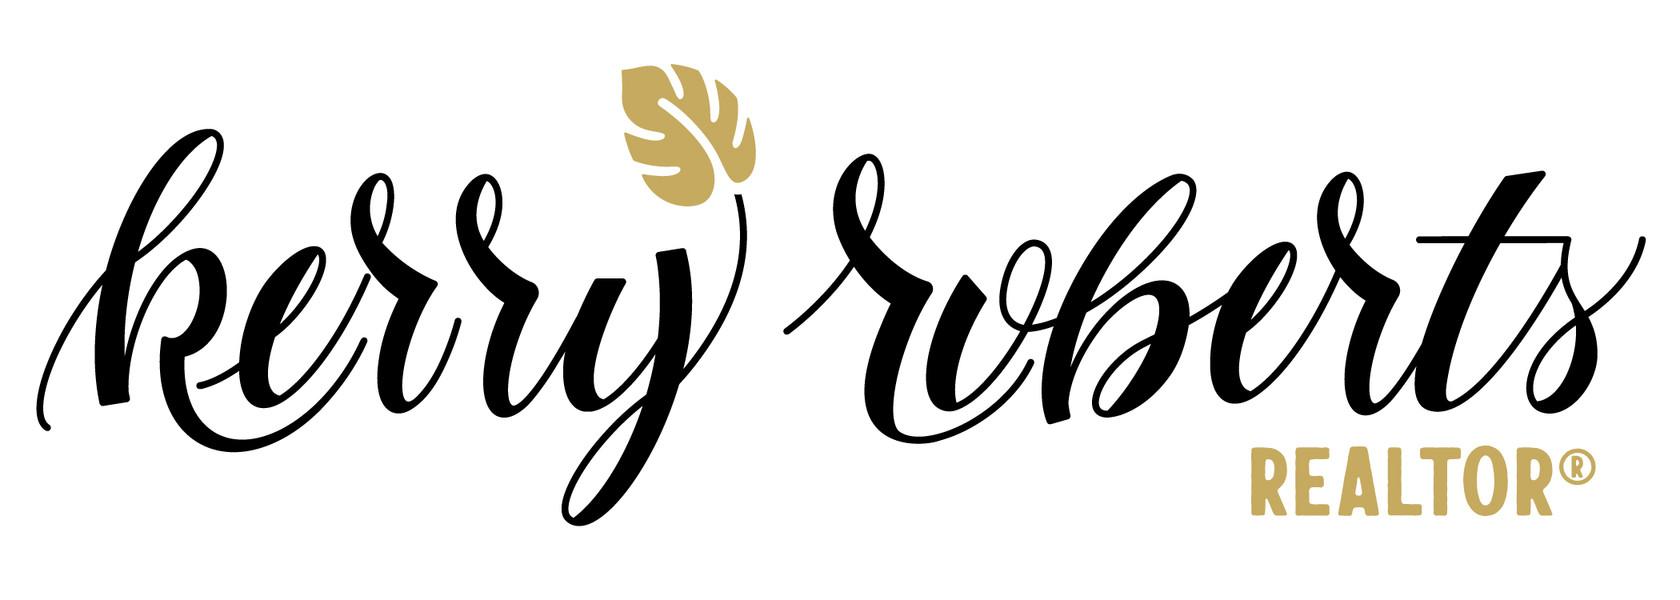 Kerry Roberts, Realtor Logo